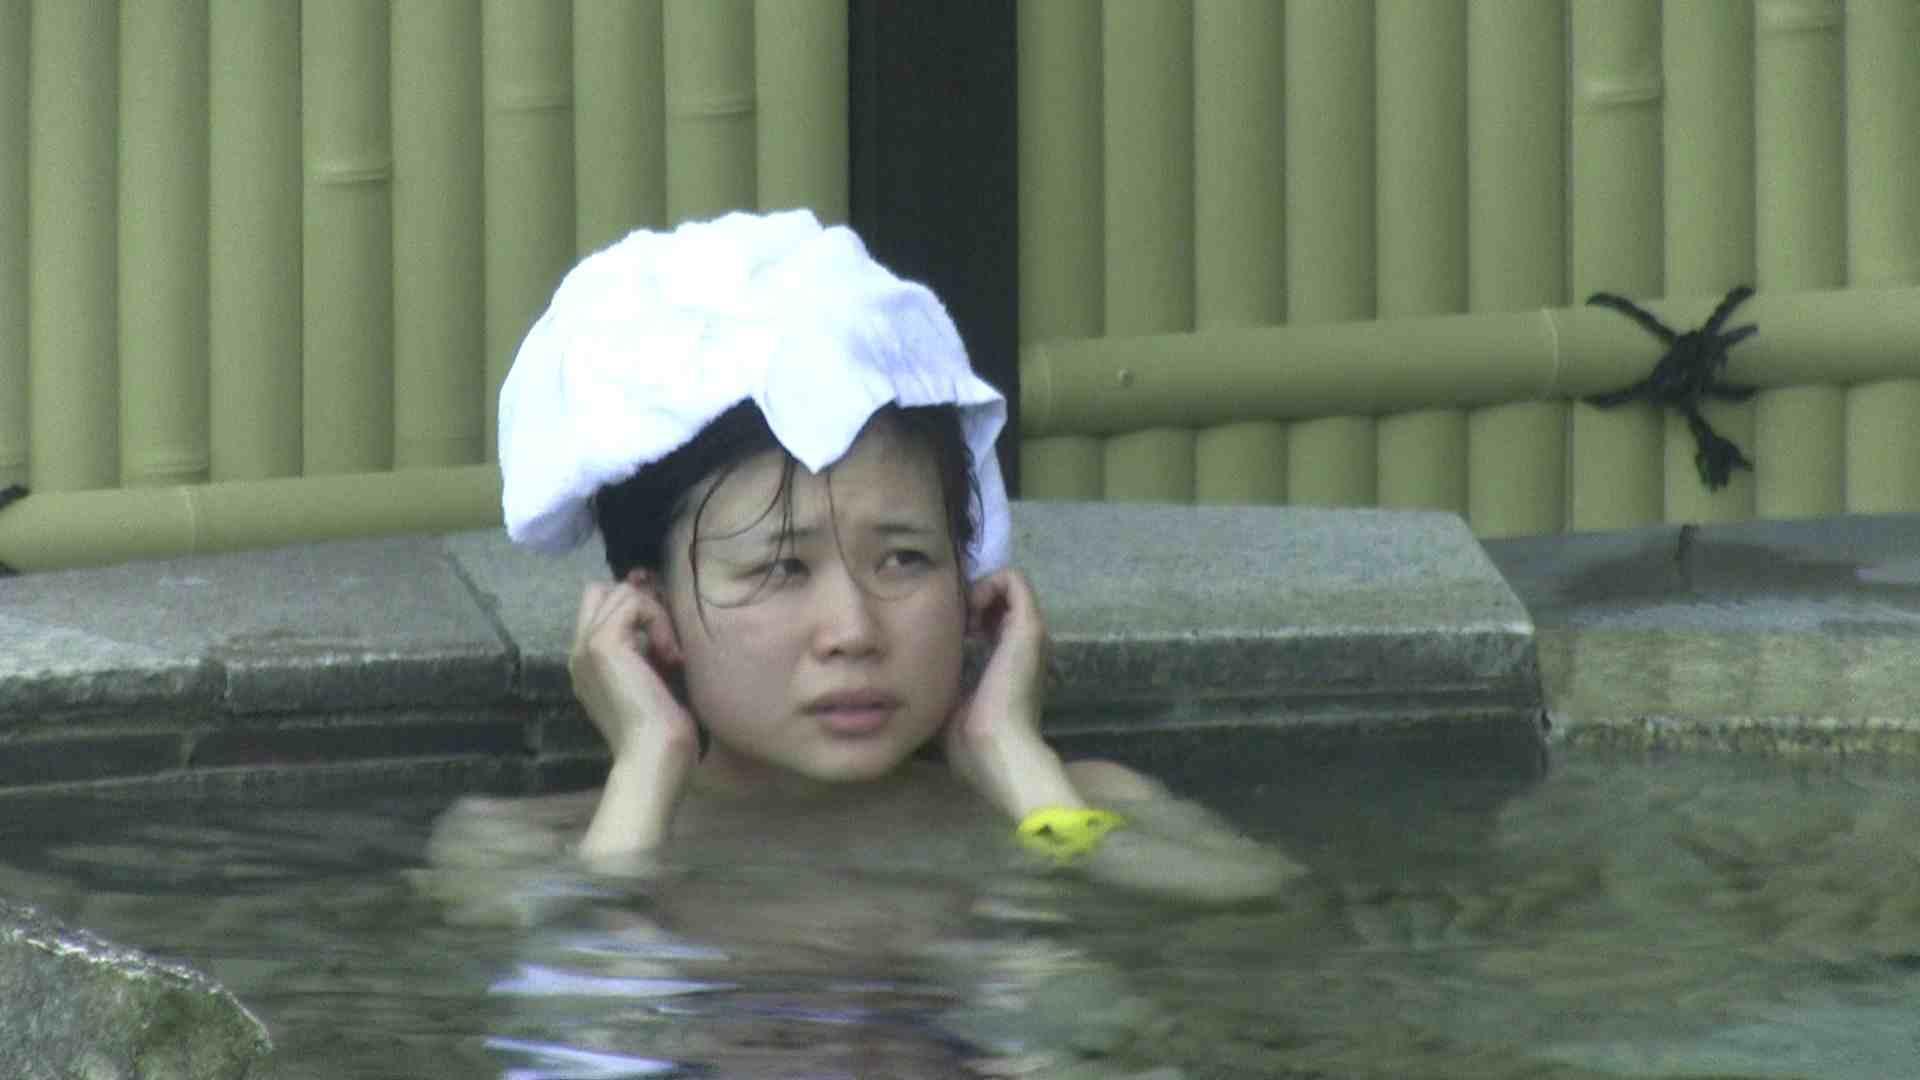 Aquaな露天風呂Vol.183 露天風呂編 | 盗撮シリーズ  104PIX 67